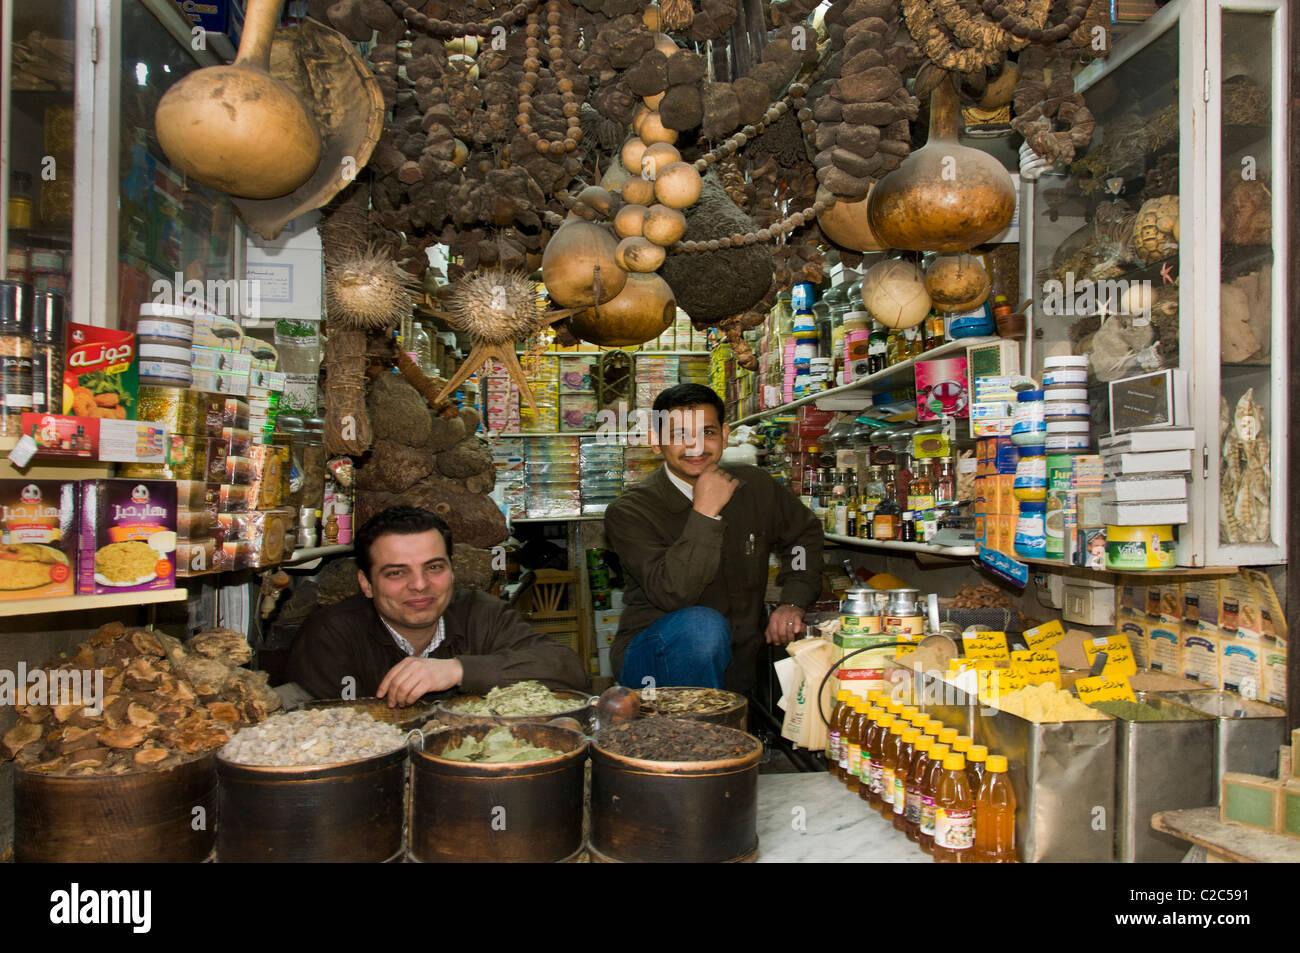 Damaskus Syrien Lebensmittelhändler Lebensmittelgeschäft Basar Souk Markt Stockbild